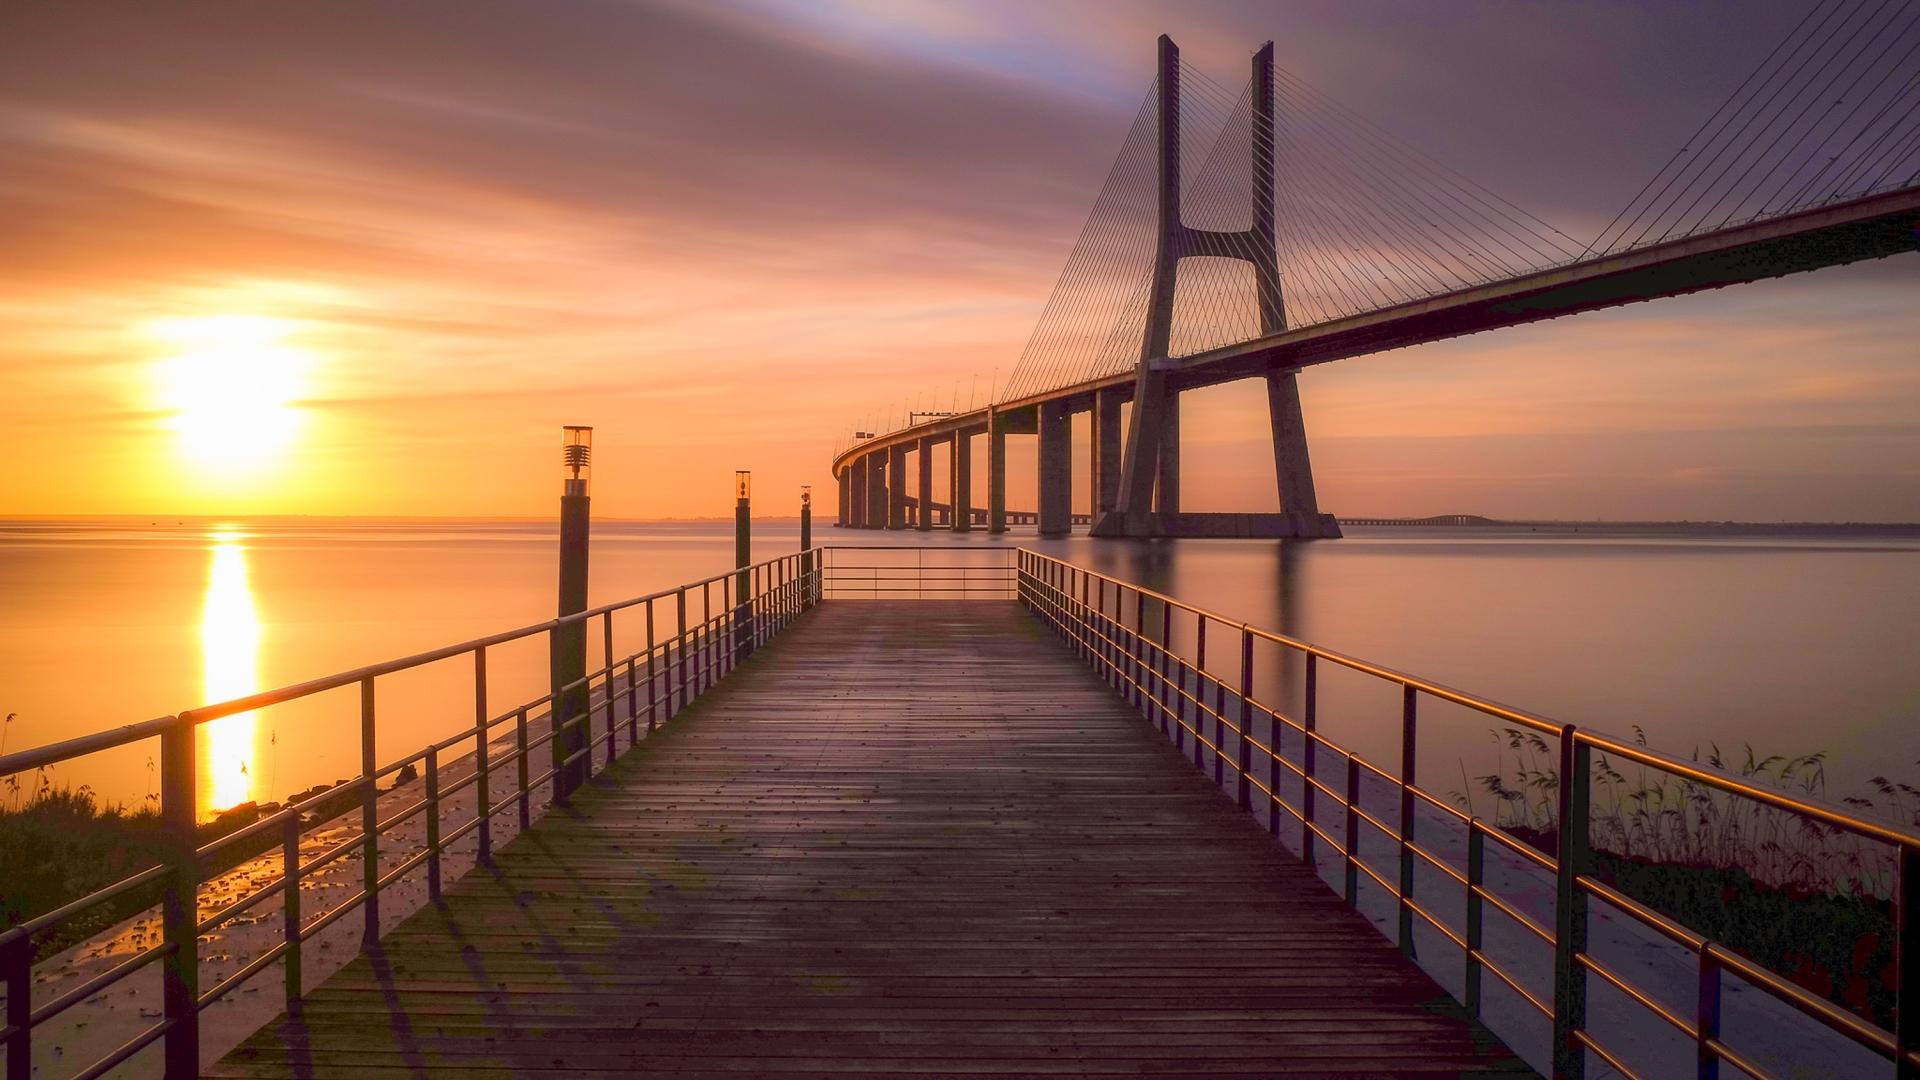 Мост на фоне заката загрузить